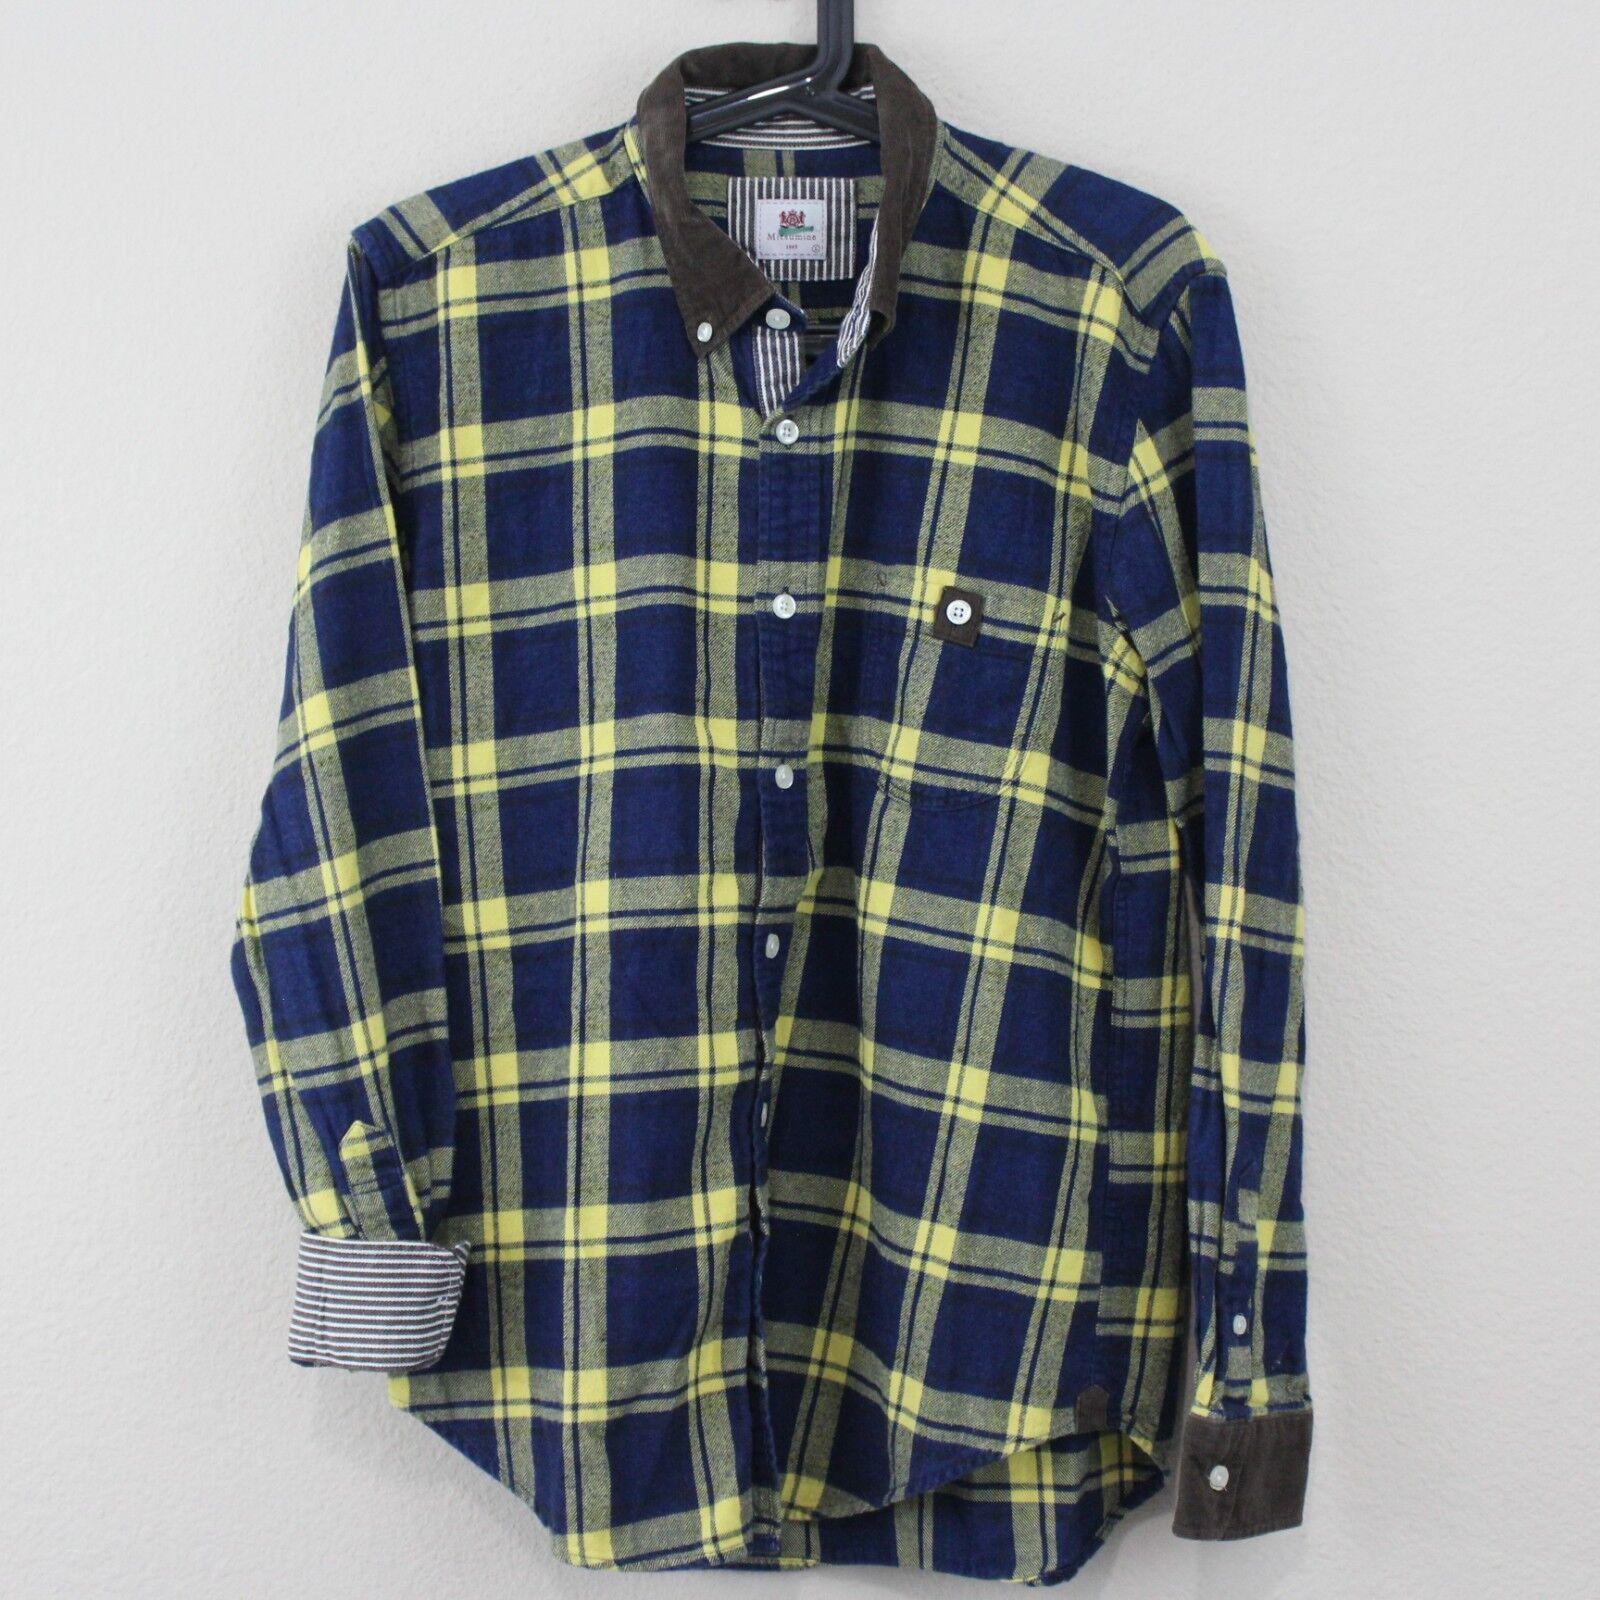 Mitsumine Japan Mens Large Plaid Corduroy Flannel Button Up Shirt D369